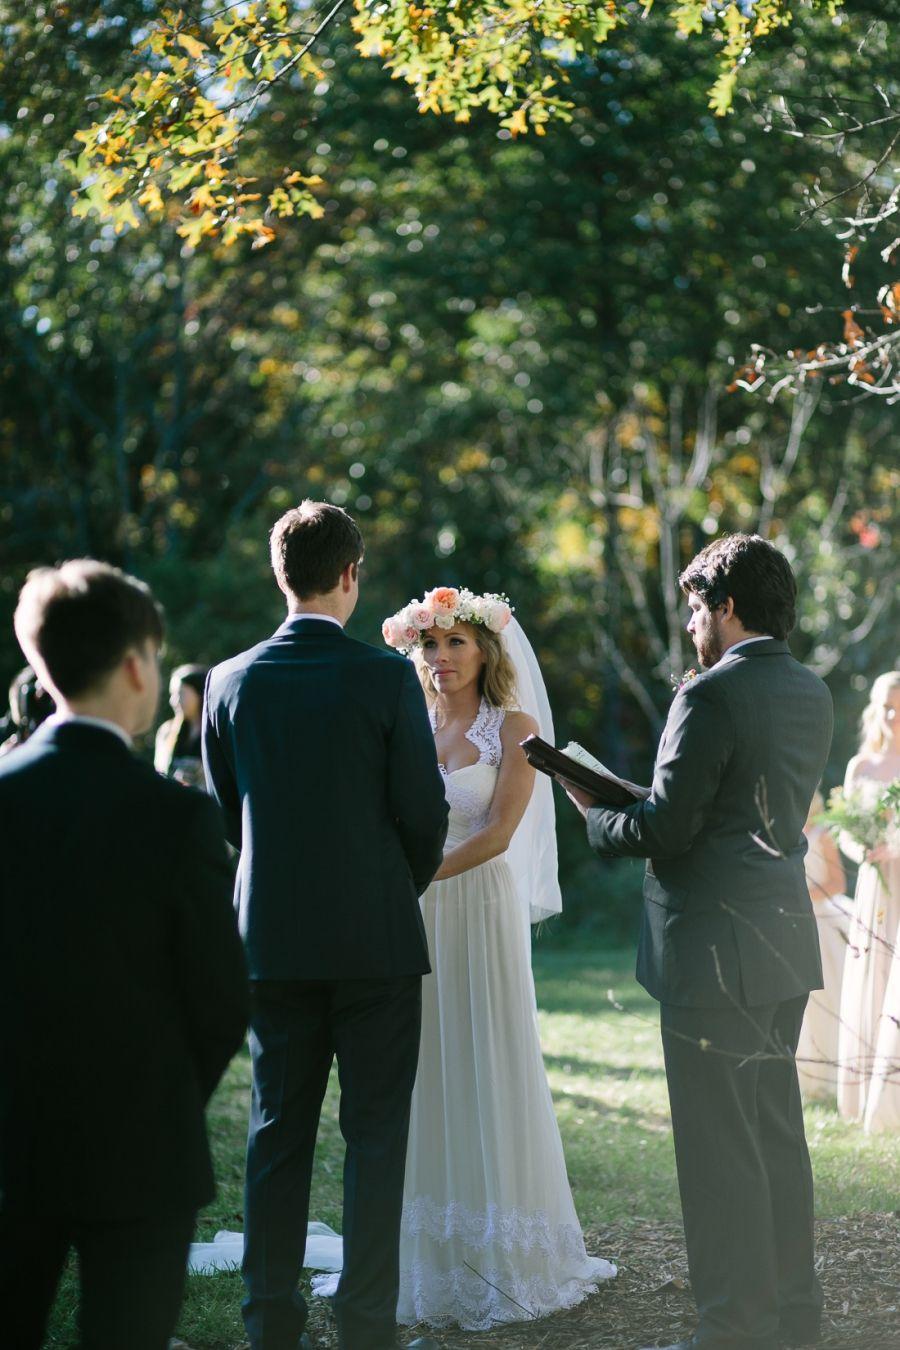 Allie Jordan pinalexis martin on j&a wedding | springfield mo